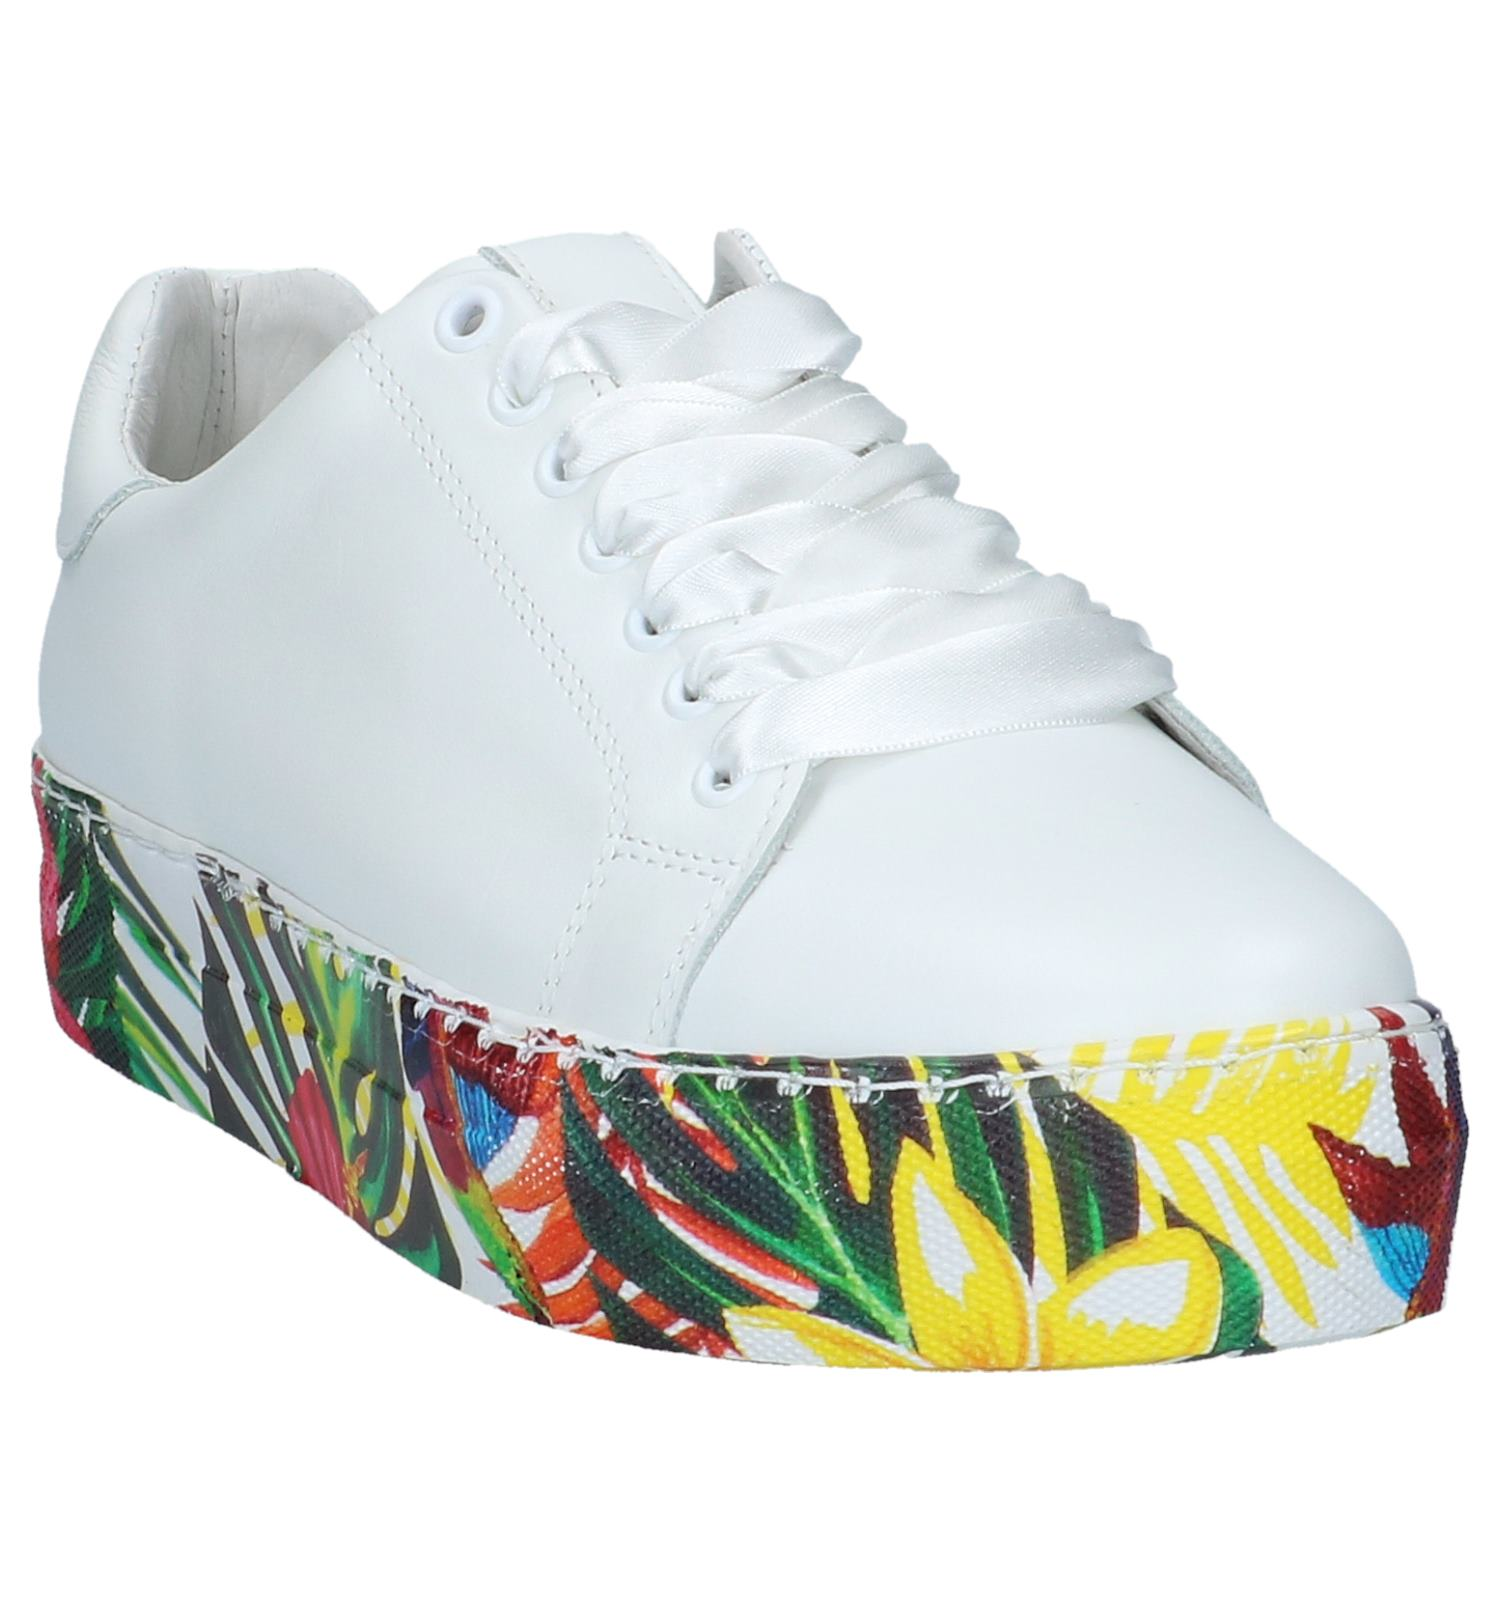 bba973c67d4 Witte Lage Geklede Sneakers met Bloemen Via Limone by Amalia | TORFS.BE |  Gratis verzend en retour